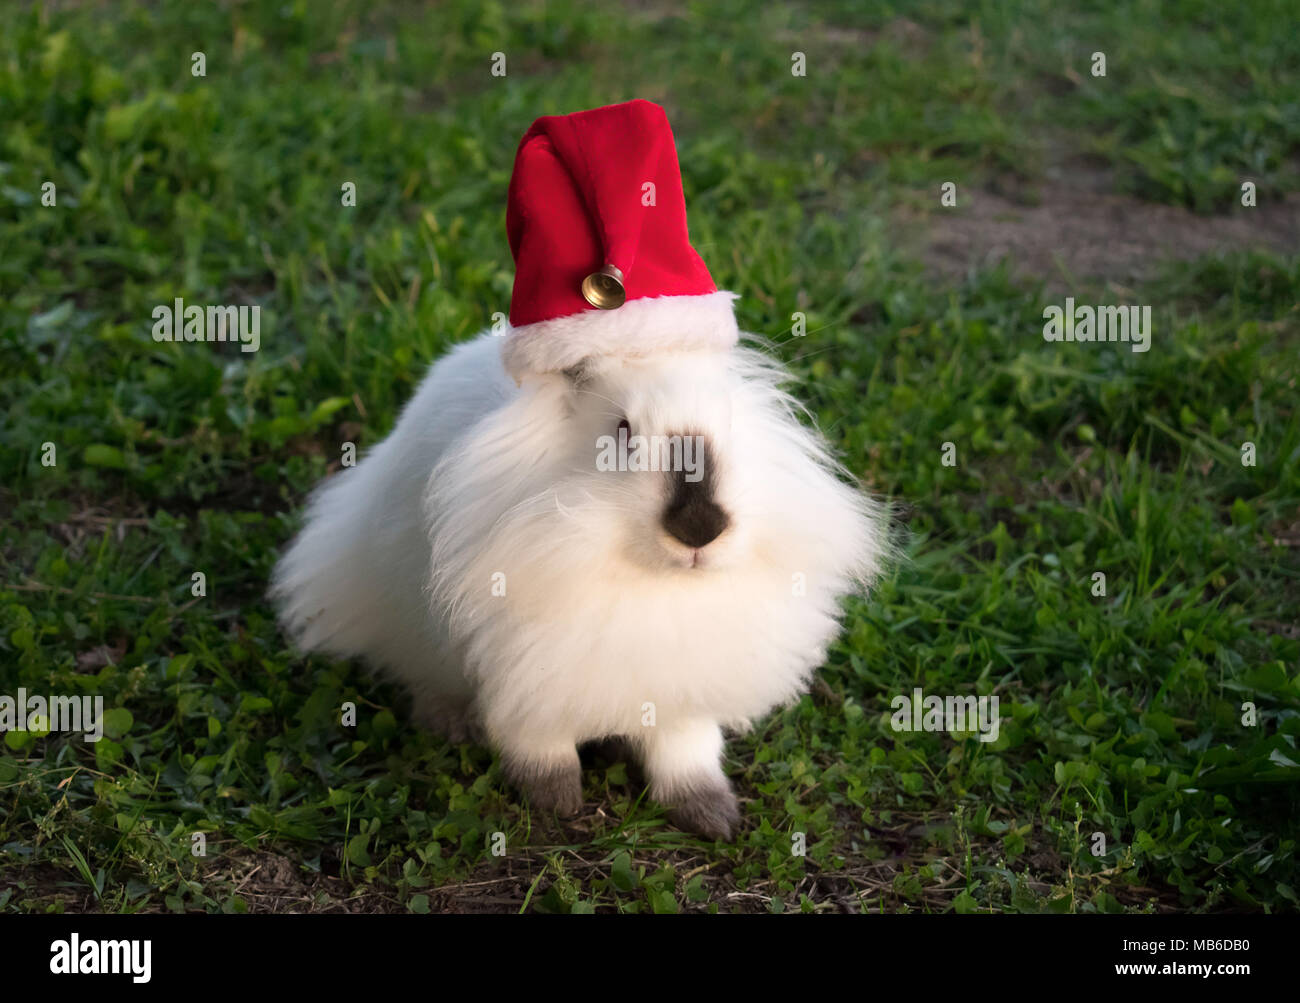 Lionhead Rabbit Stock Photo